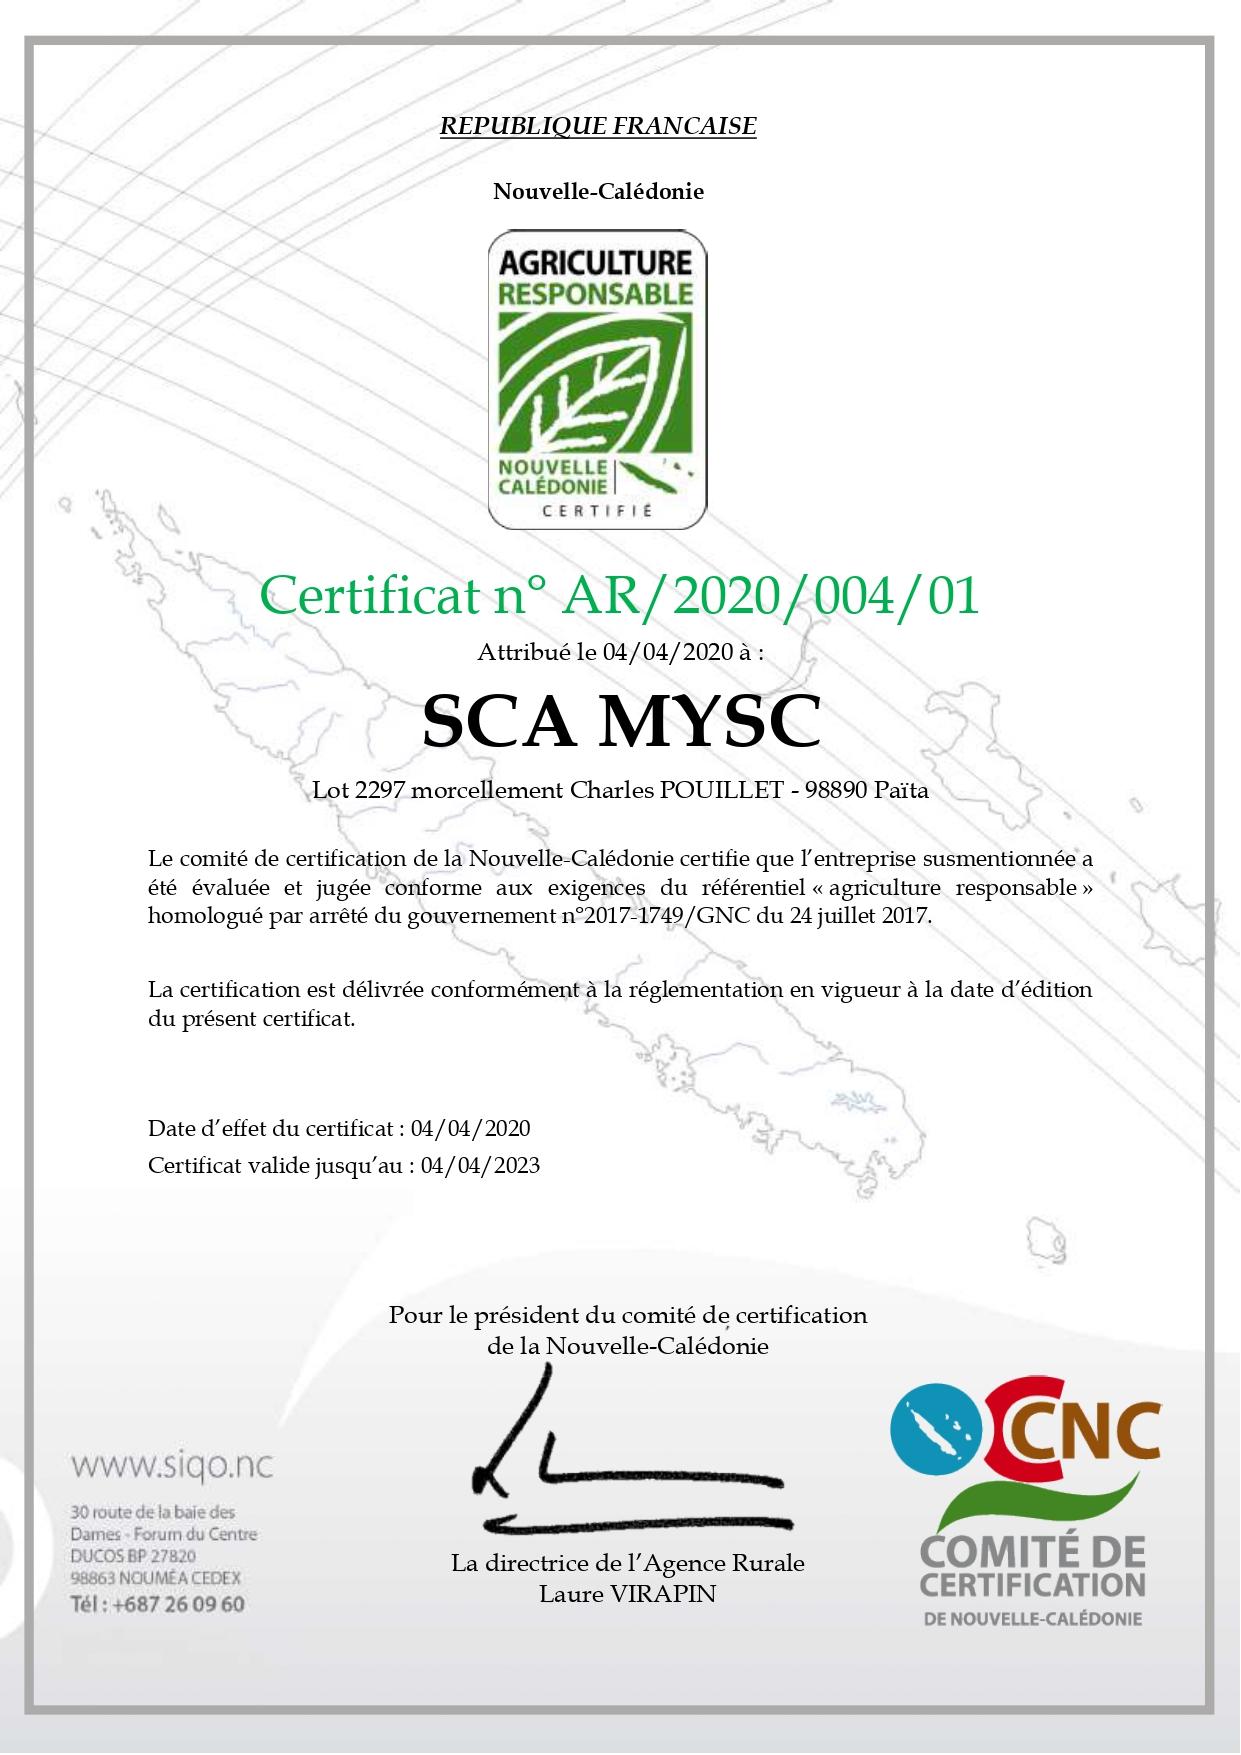 Agriculture+Responsable+AR+association+certification+nouvelle caledonie+innovante+mysc+sca